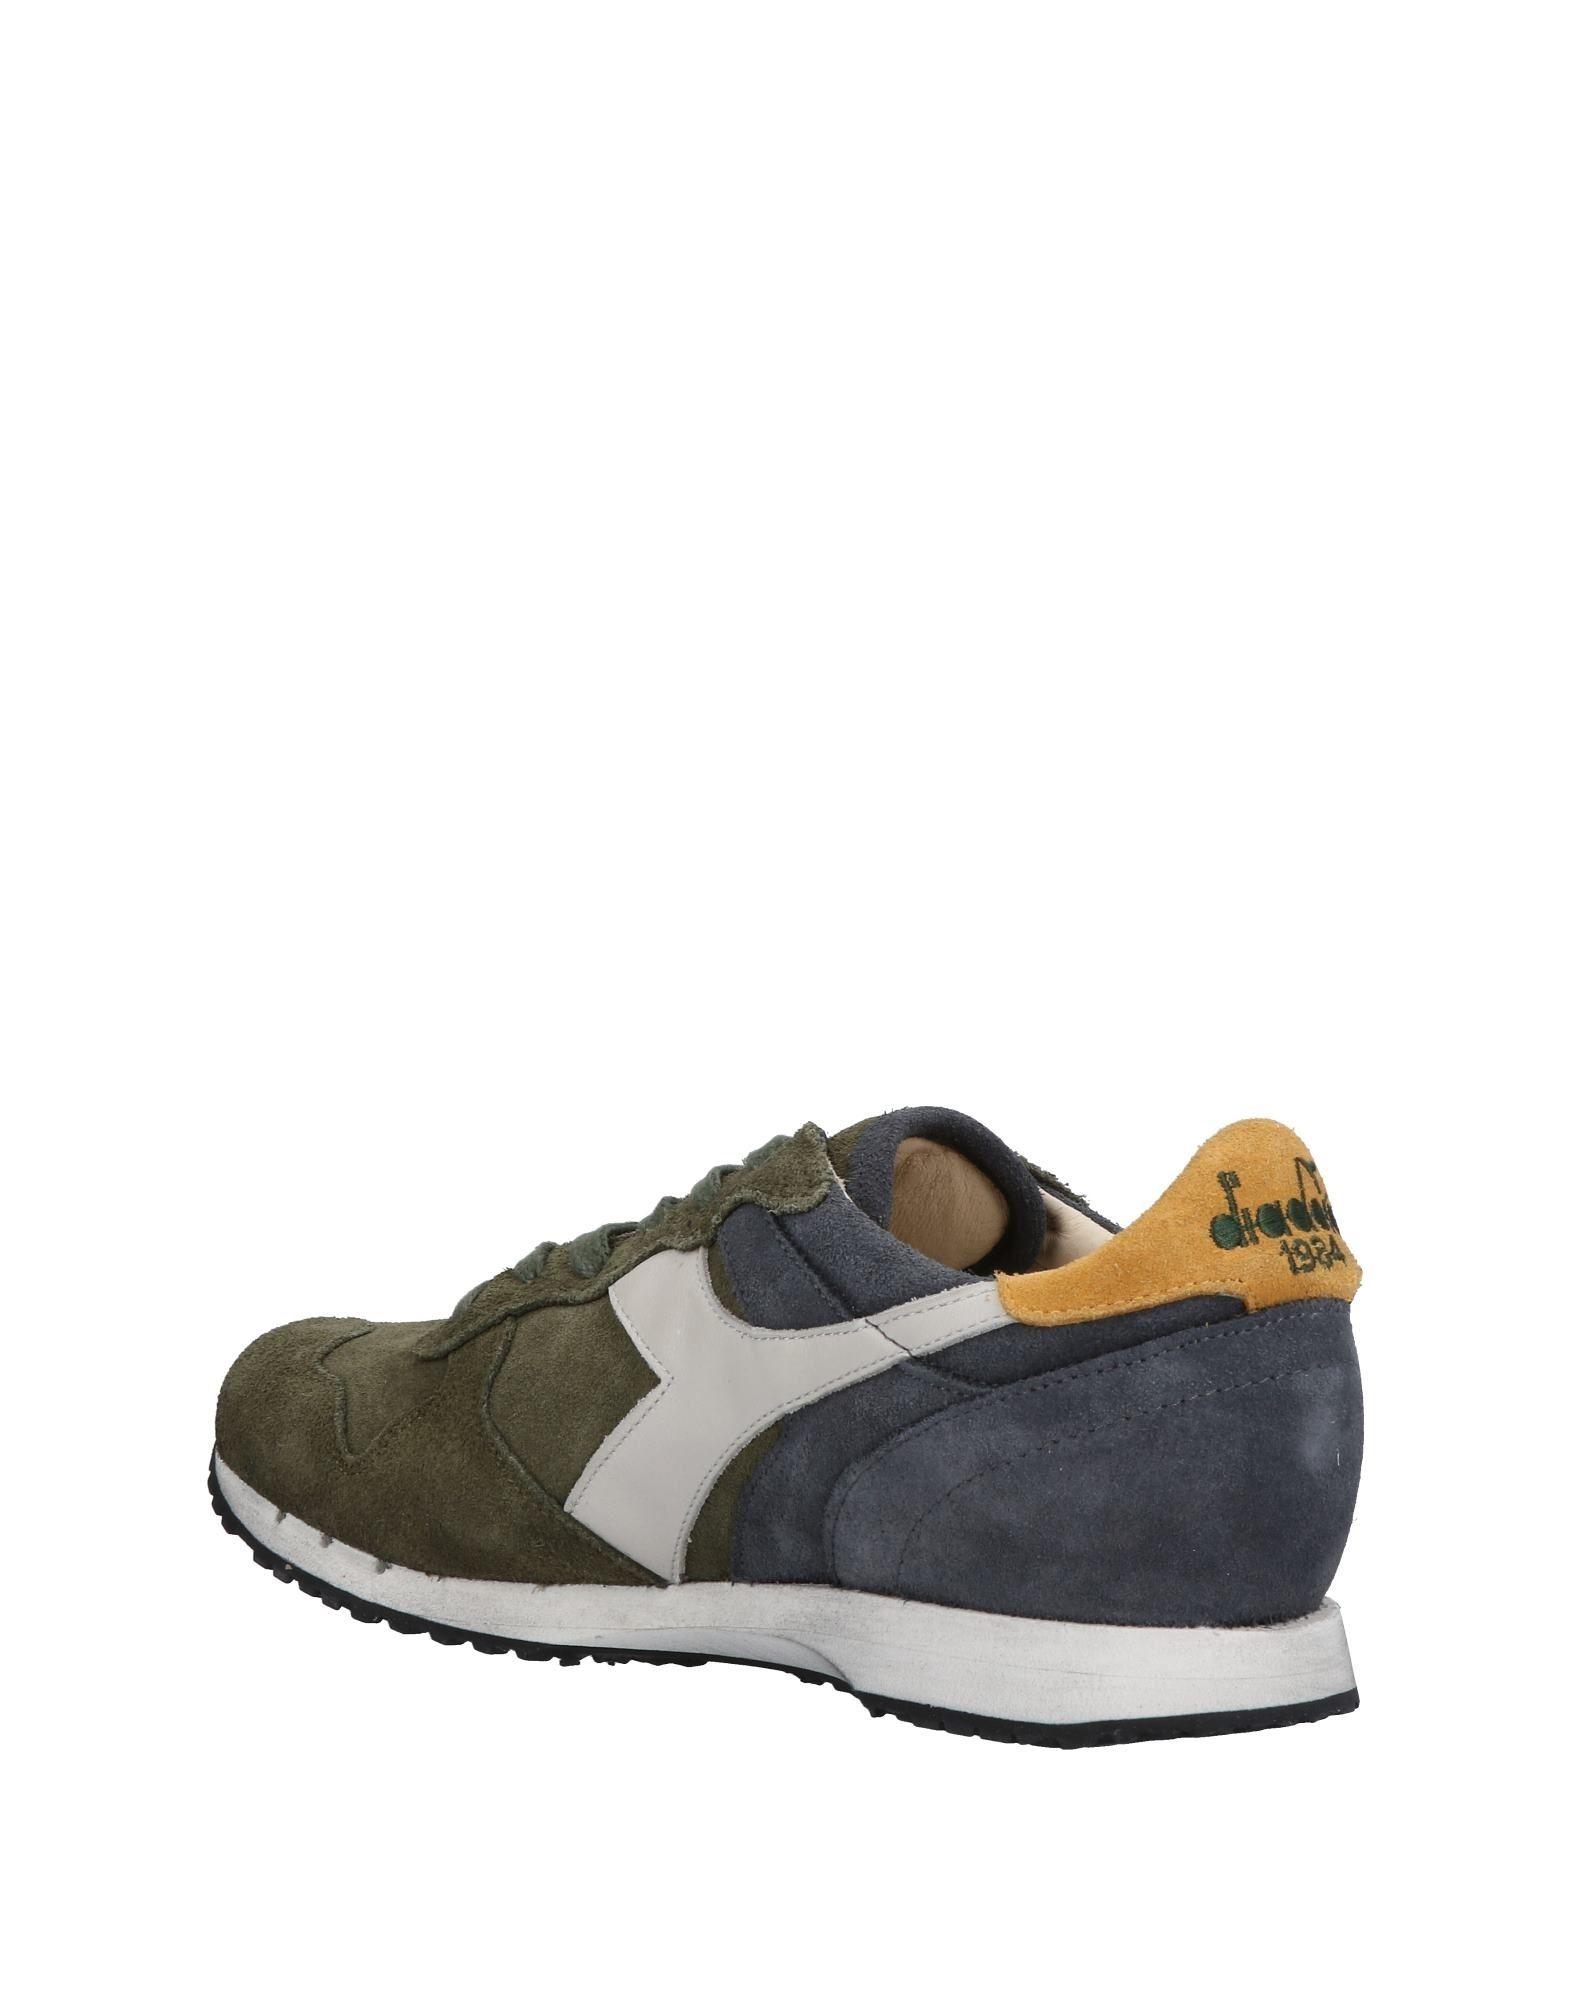 Rabatt echte Schuhe Herren Diadora Heritage Sneakers Herren Schuhe  11465959KM f27ff0